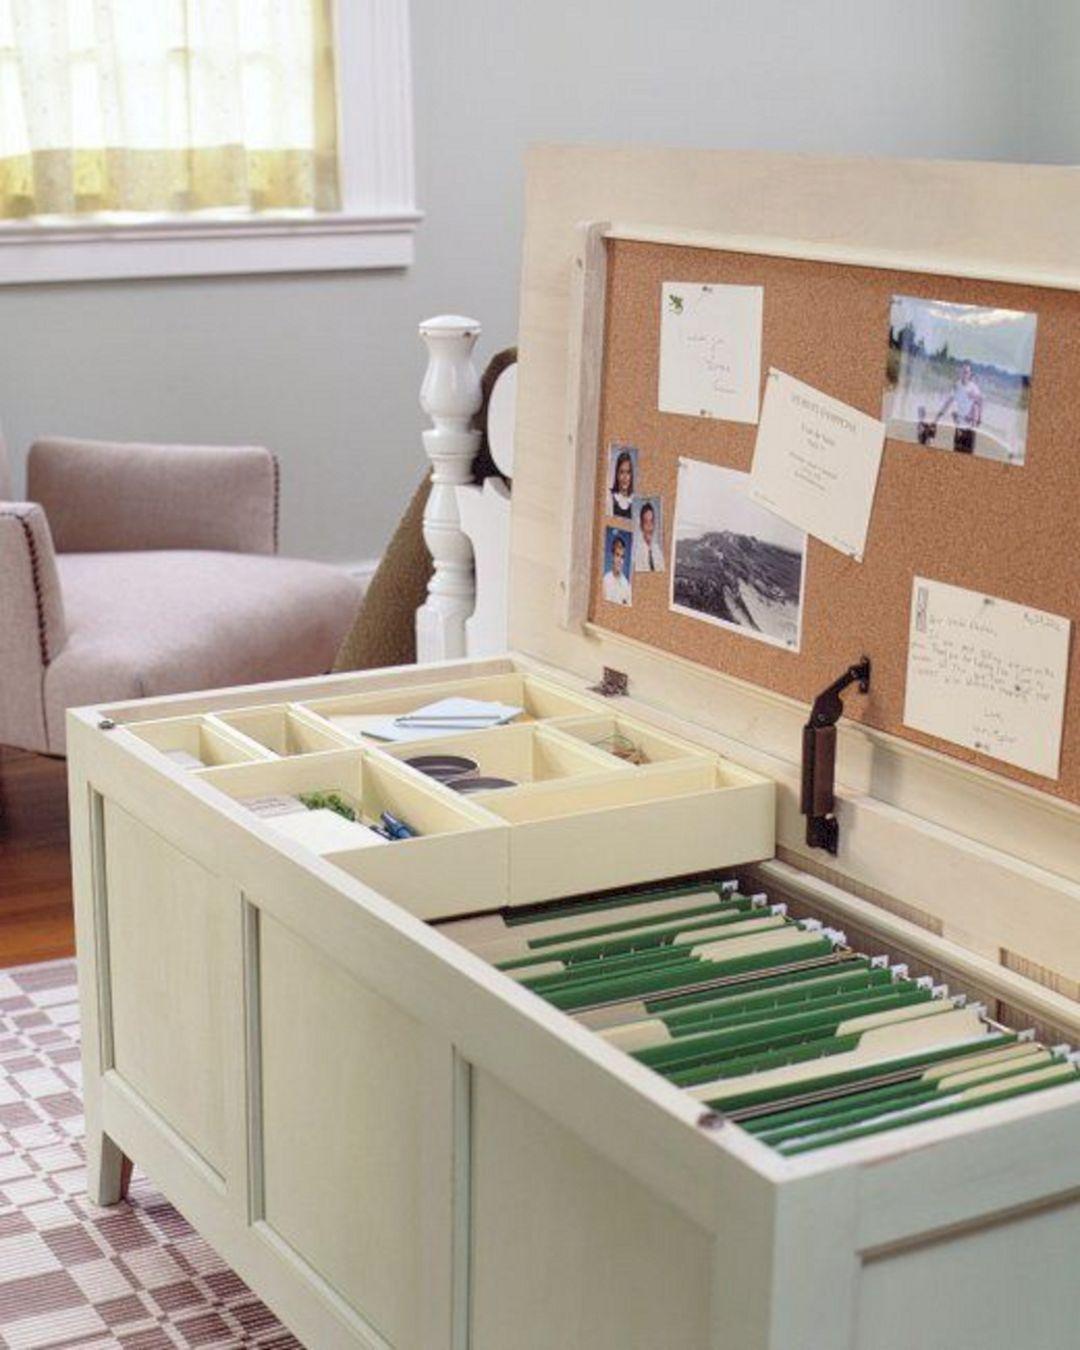 50 Expert Bedroom Storage Ideas Idee Rangement Rangement Maison Deco Maison